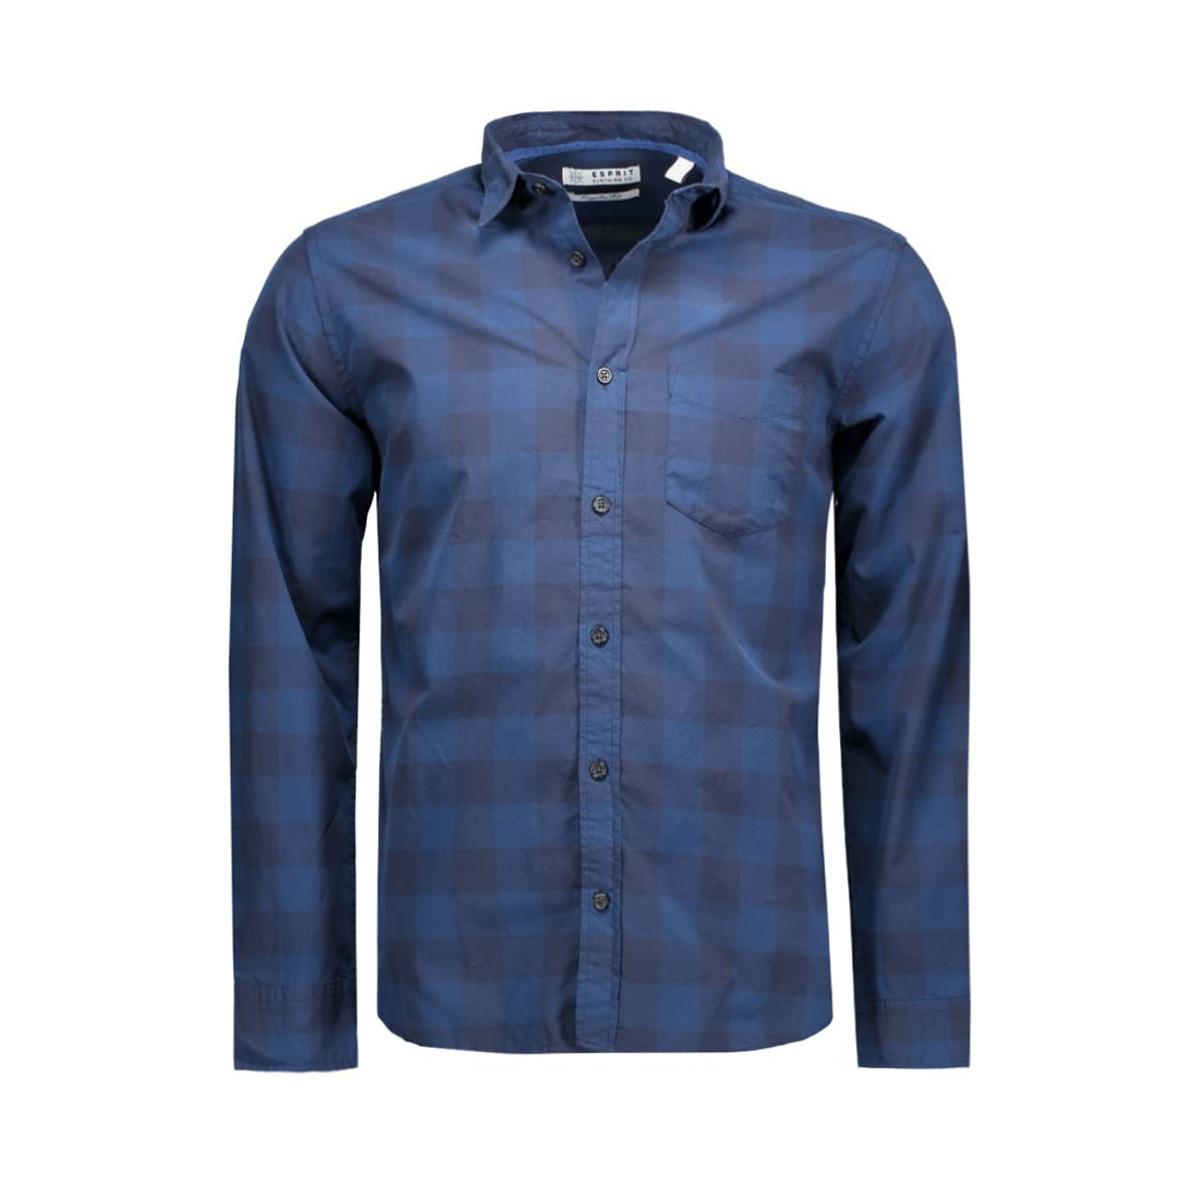 086ee2f002 esprit overhemd e400